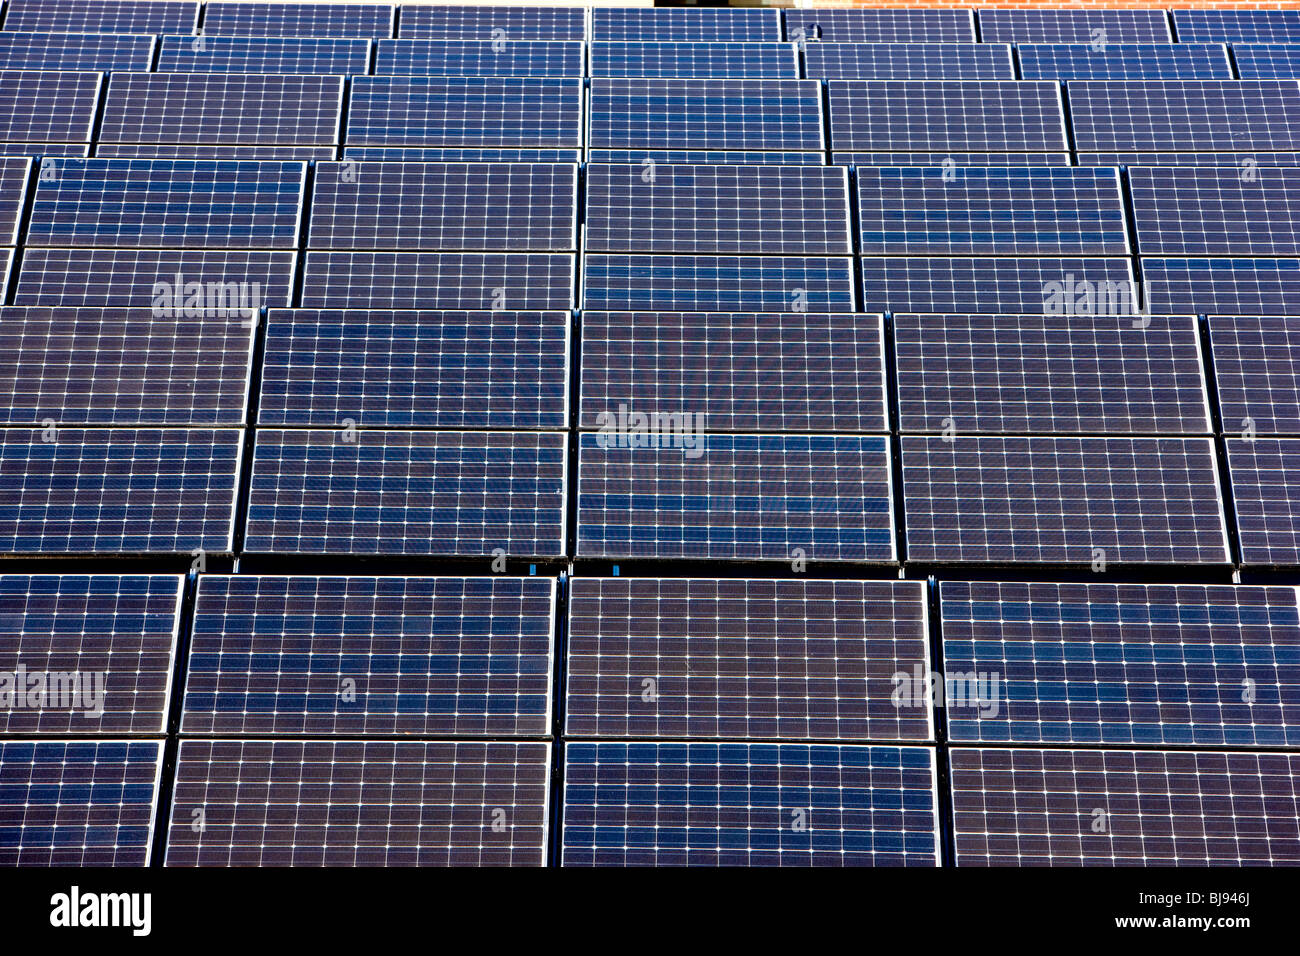 Solar Power Panels - Stock Image